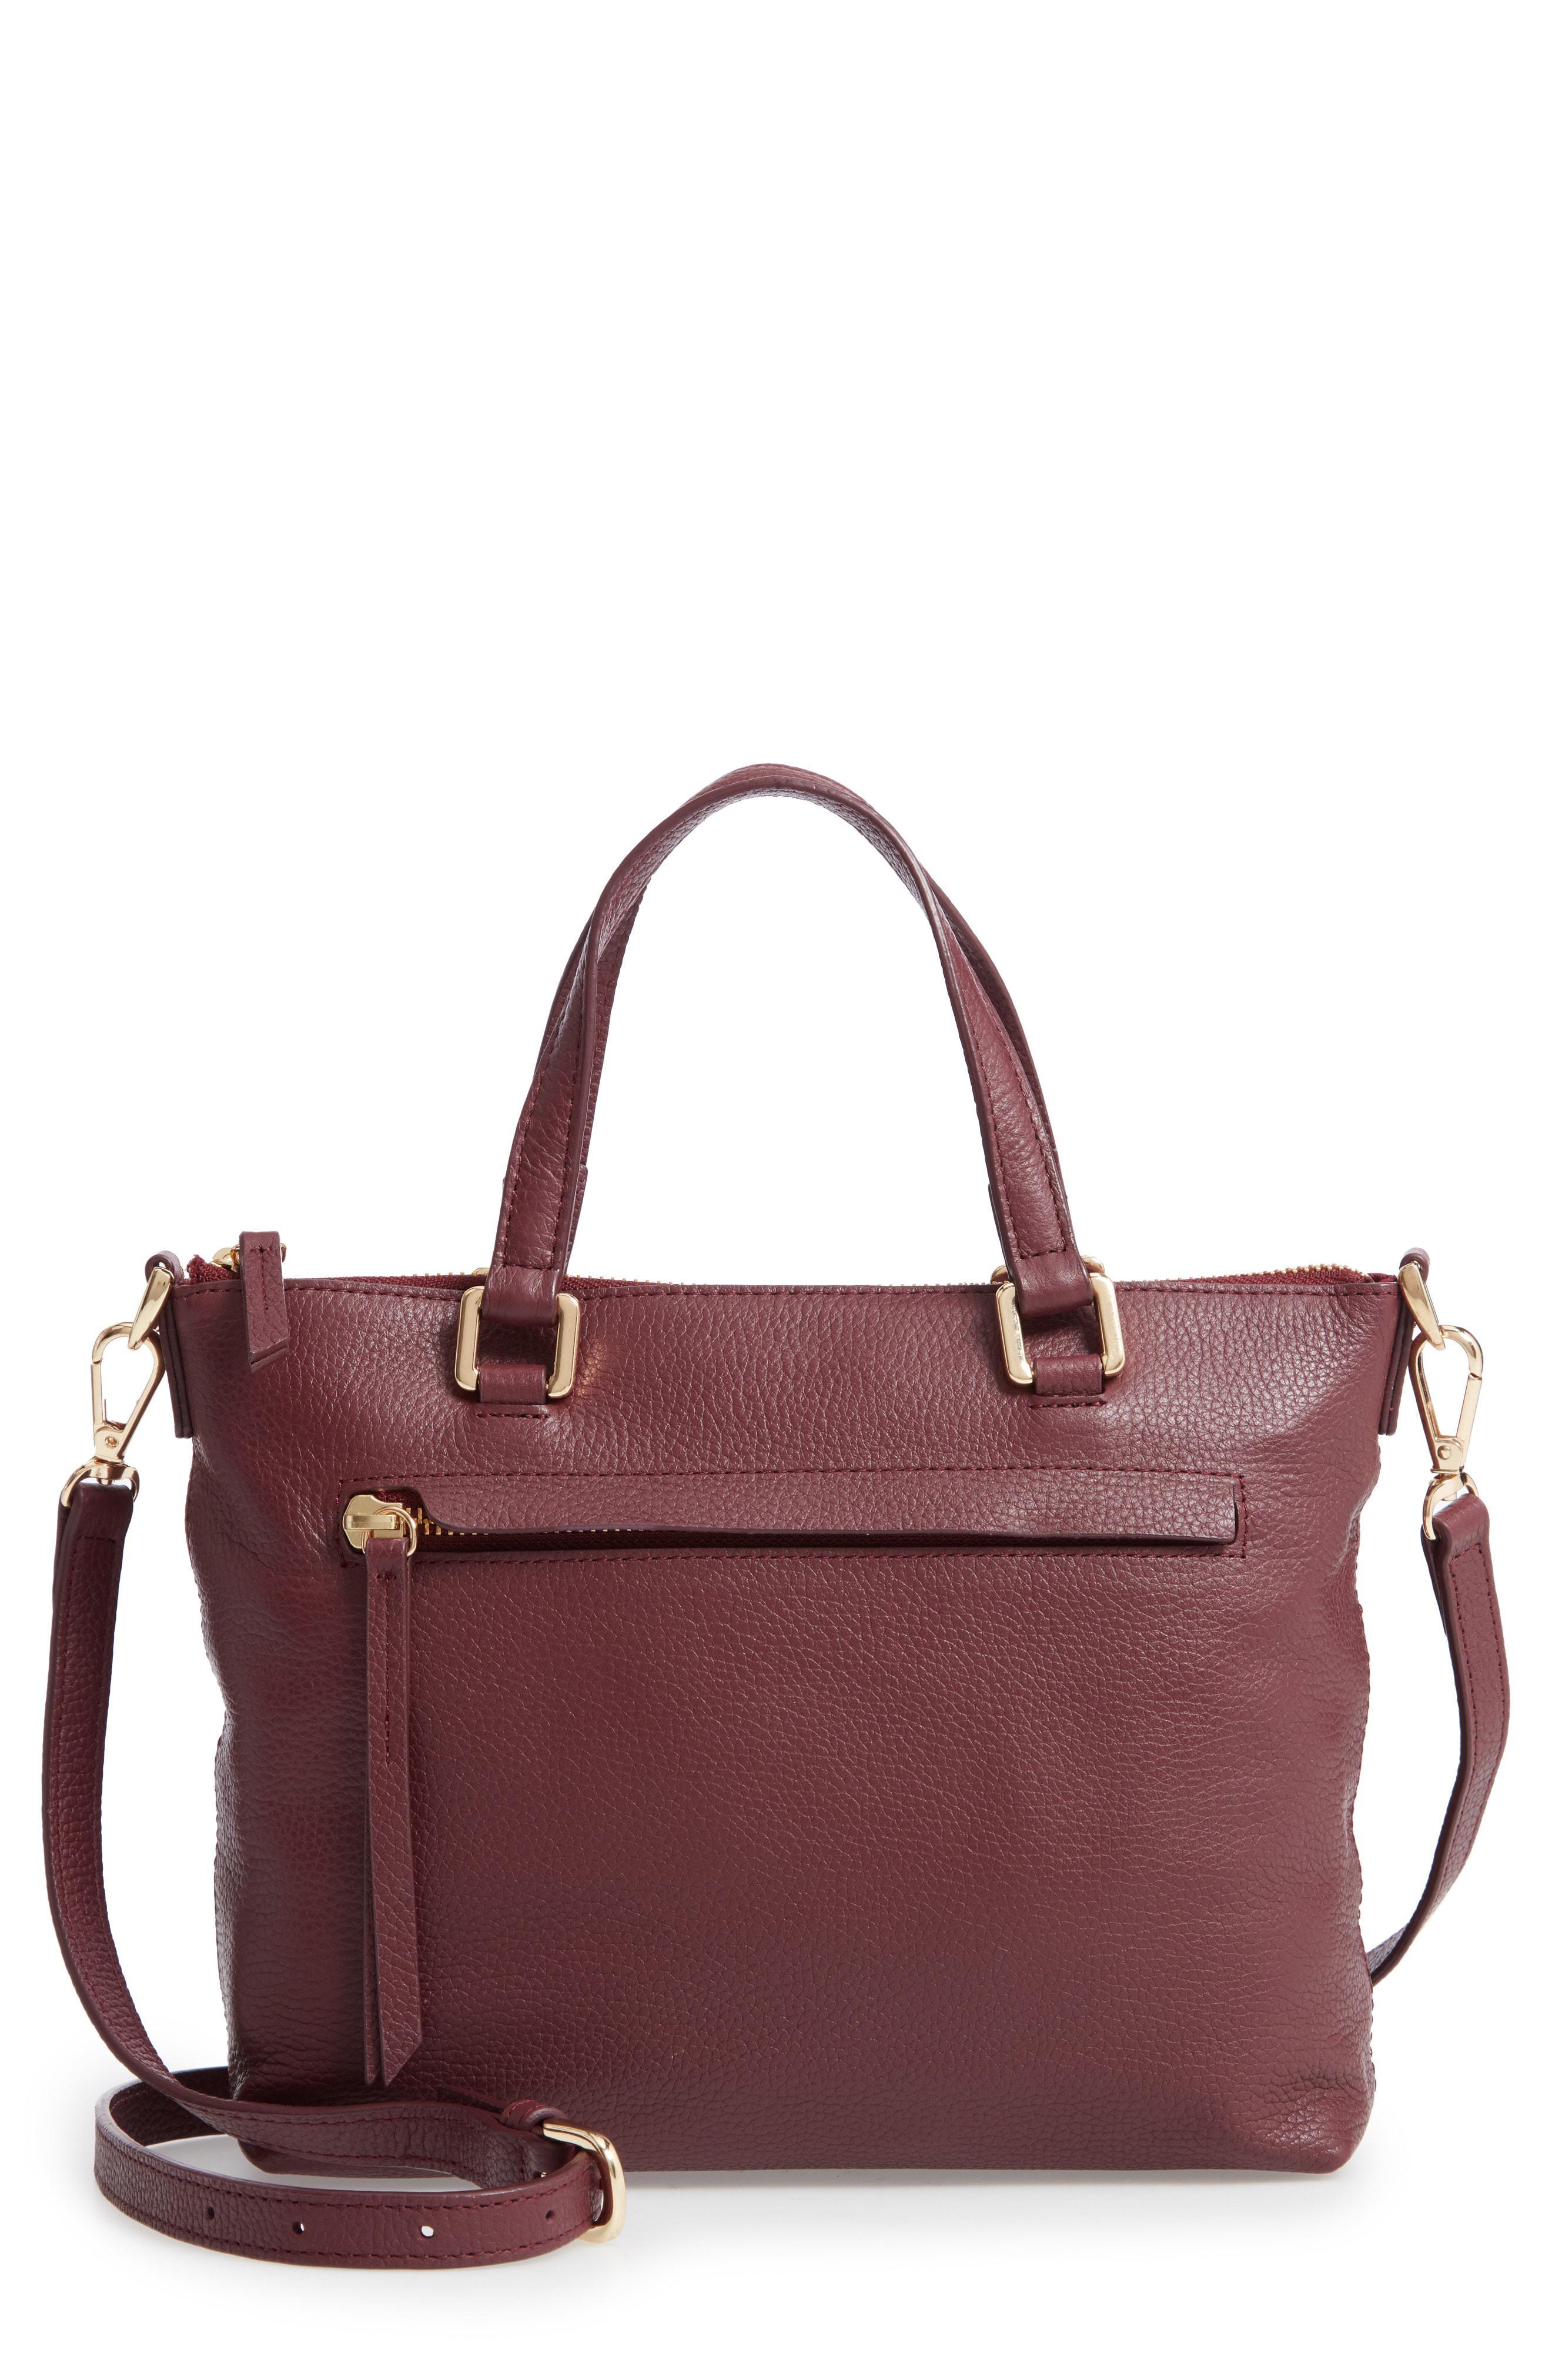 13a0ec47113 Lyst - Nordstrom Lexa Leather Crossbody Bag - Burgundy